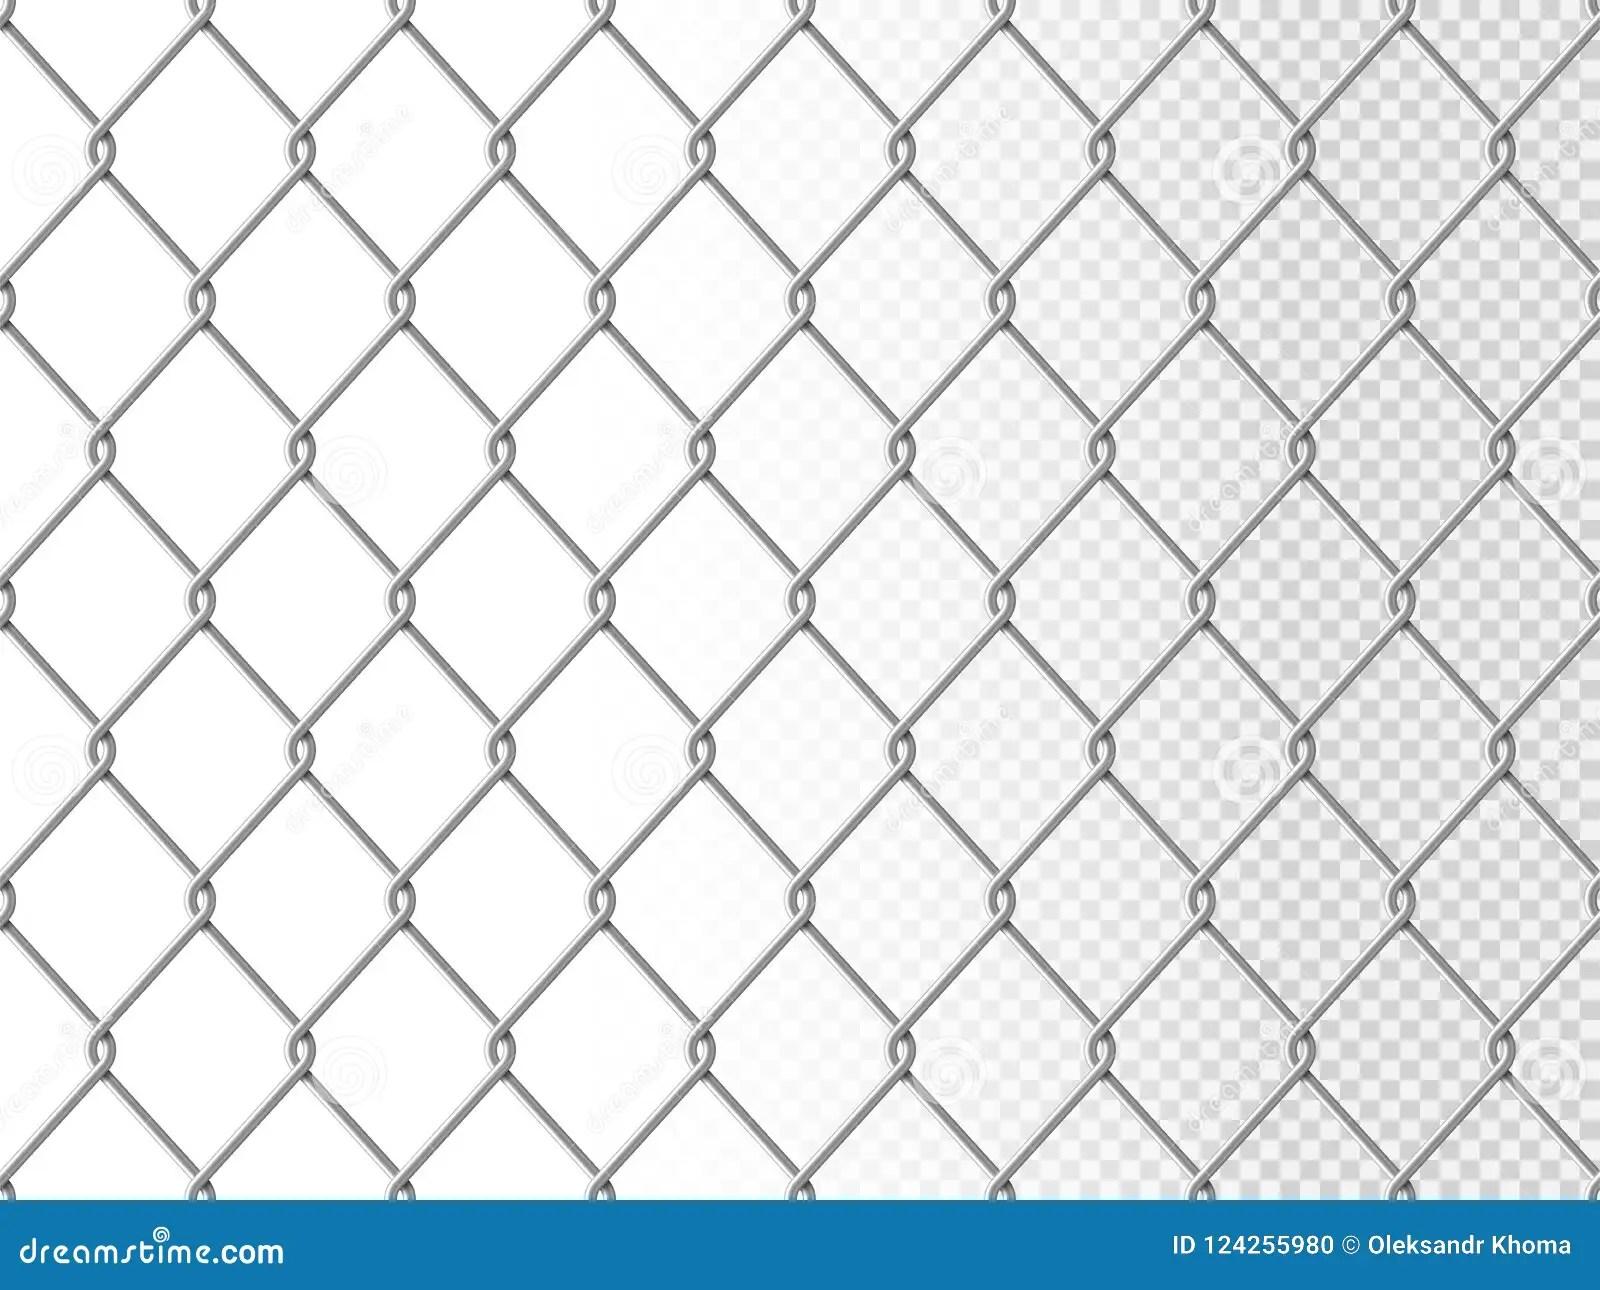 Steel Wire Mesh Seamless Background. Vector Cartoon Vector